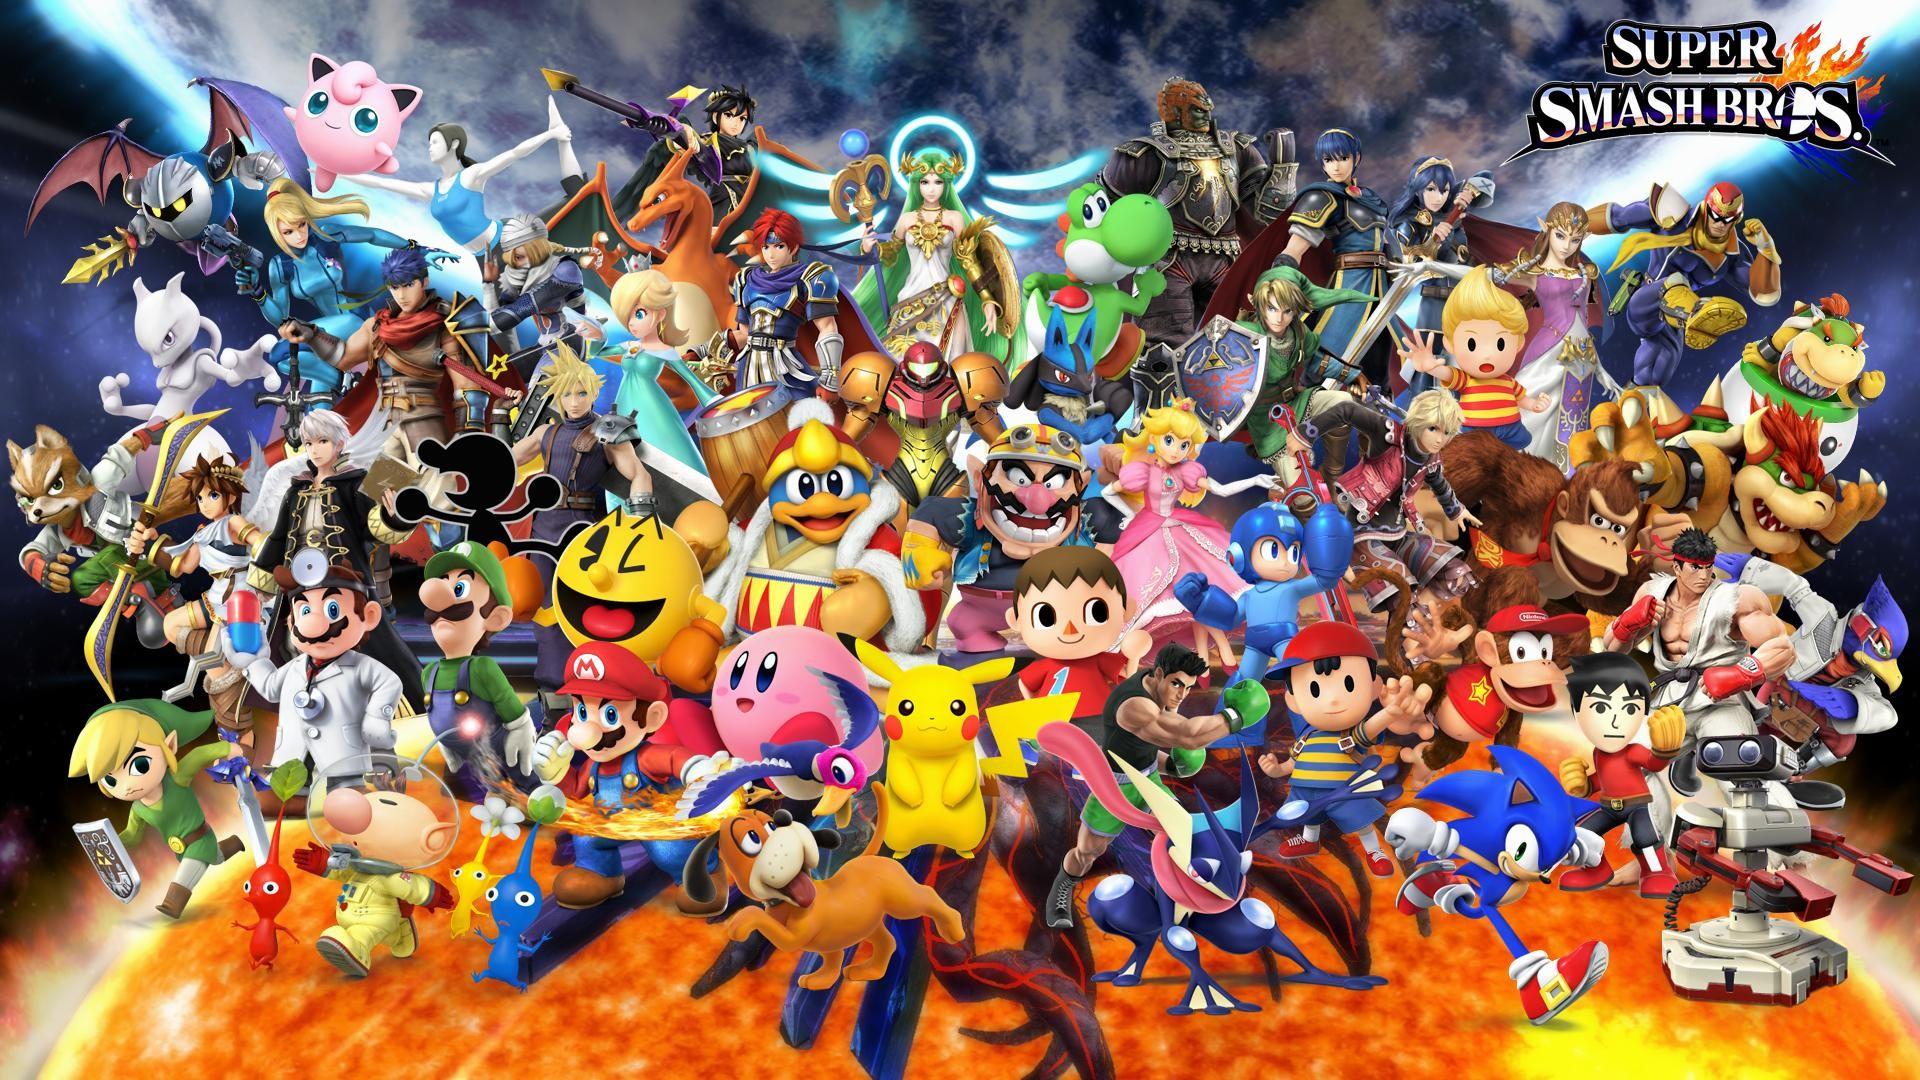 wallpaper.wiki-Free-Download-Super-Smash-Bros-Backgrounds-